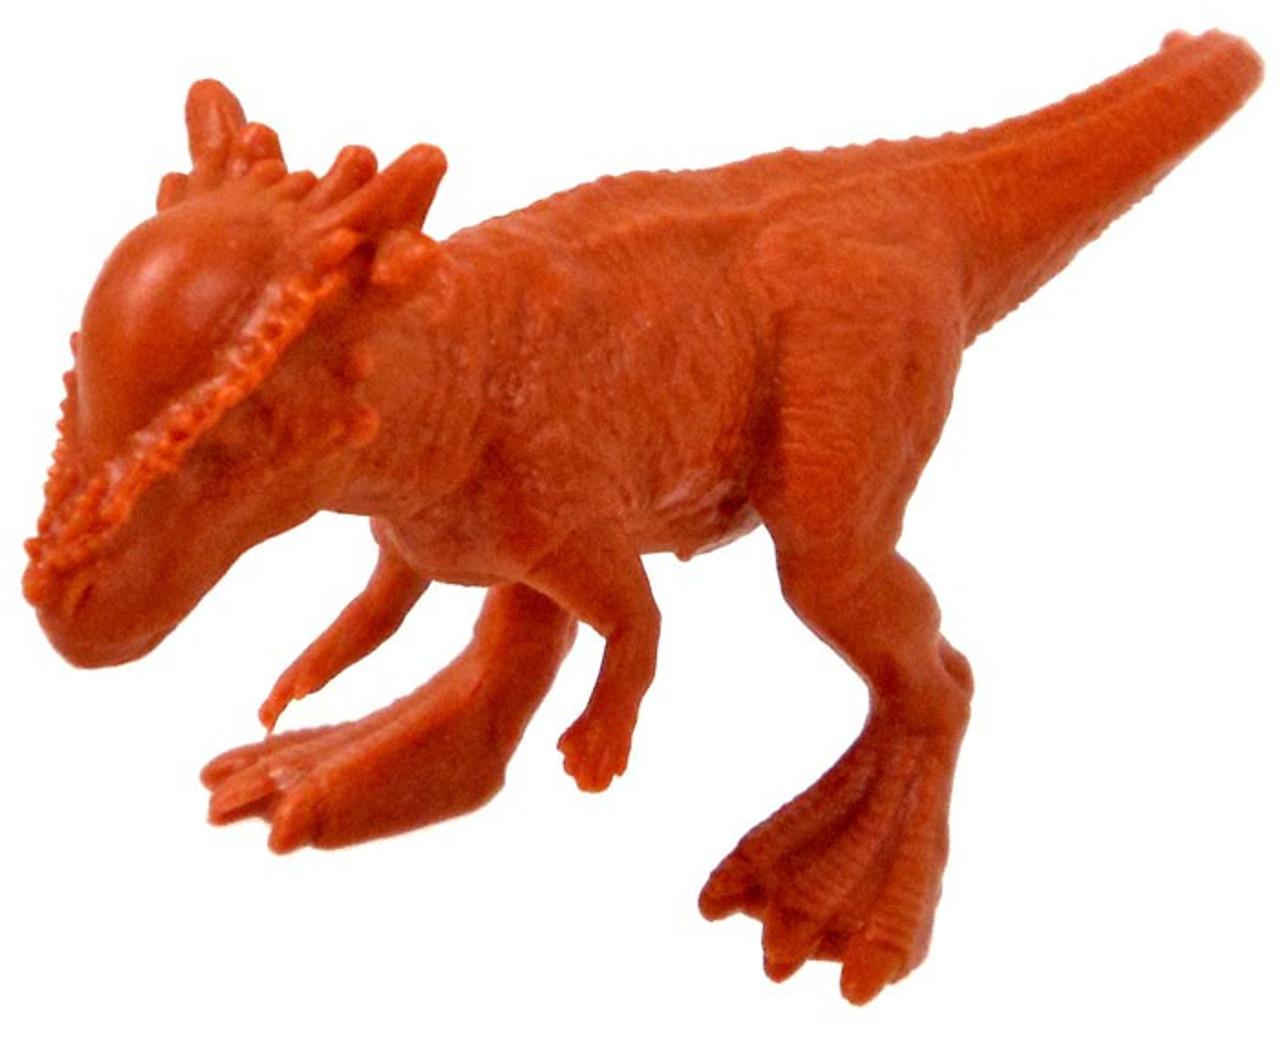 Jurassic World Matchbox Battle Damage Mini Dinosaur Figure Stygimoloch  Stiggy 2 Mini Figure Loose Mattel - ToyWiz 9c67fecf8